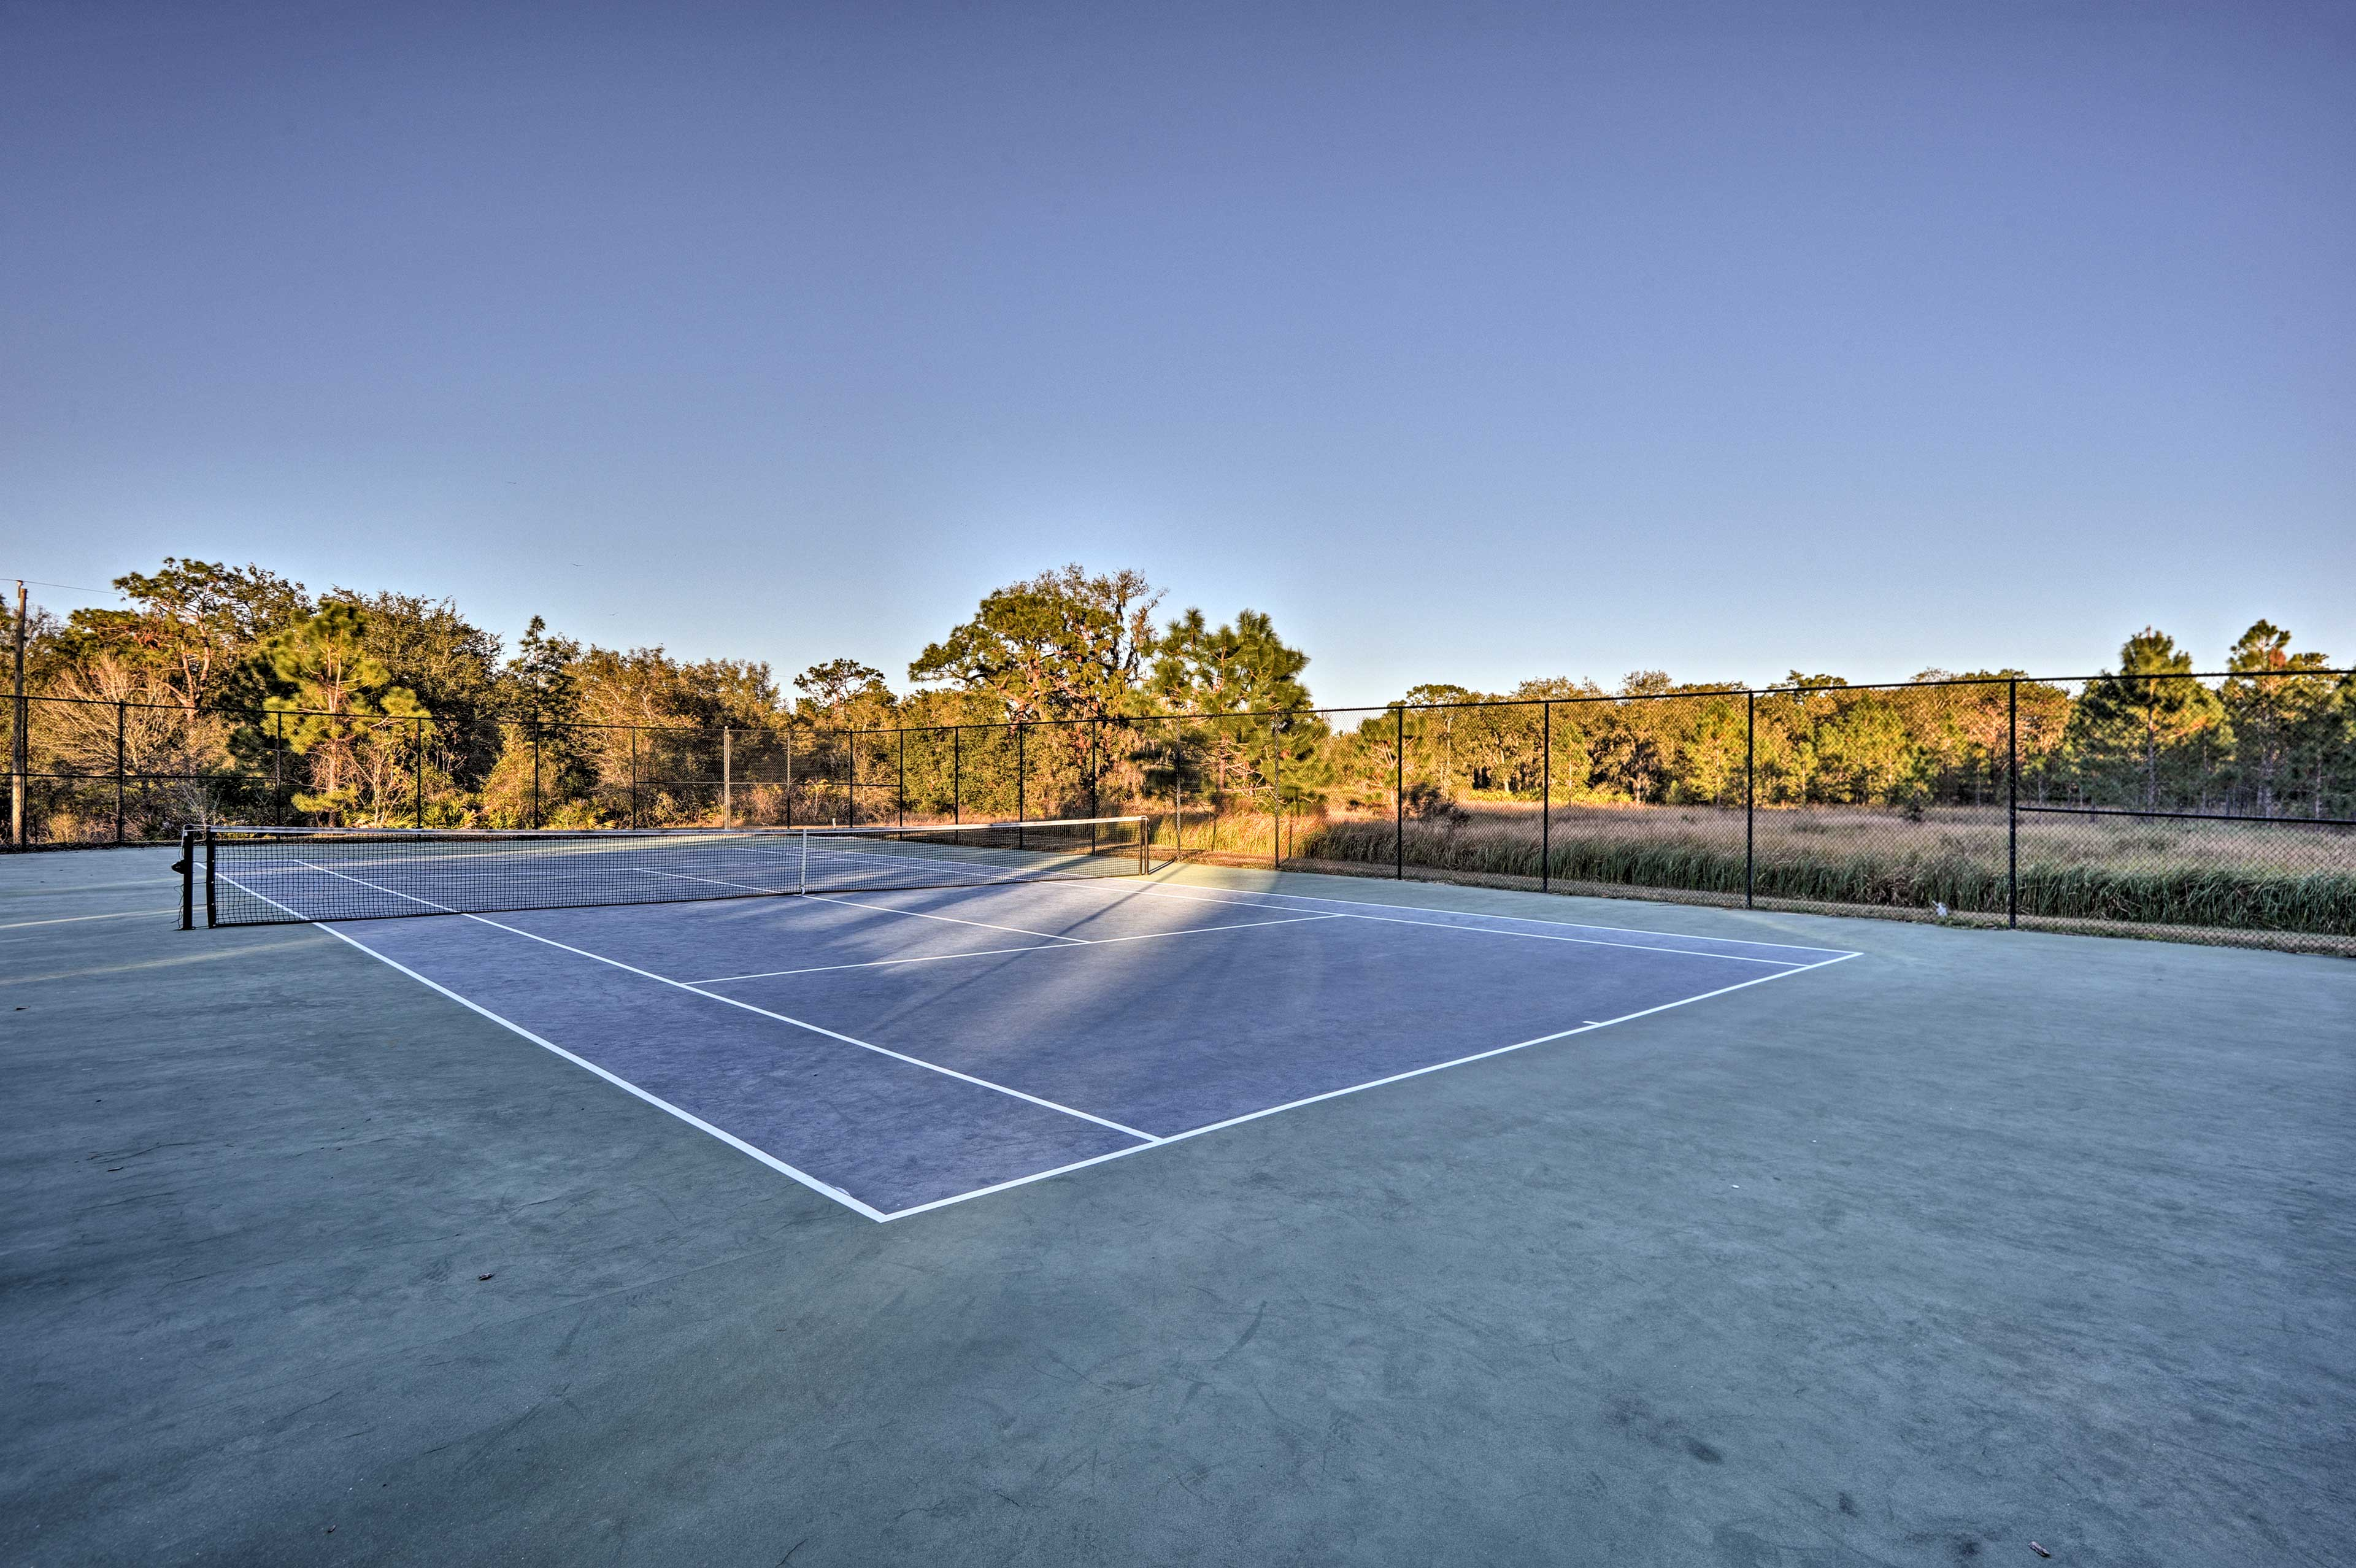 Pick teams for a tennis tournament!